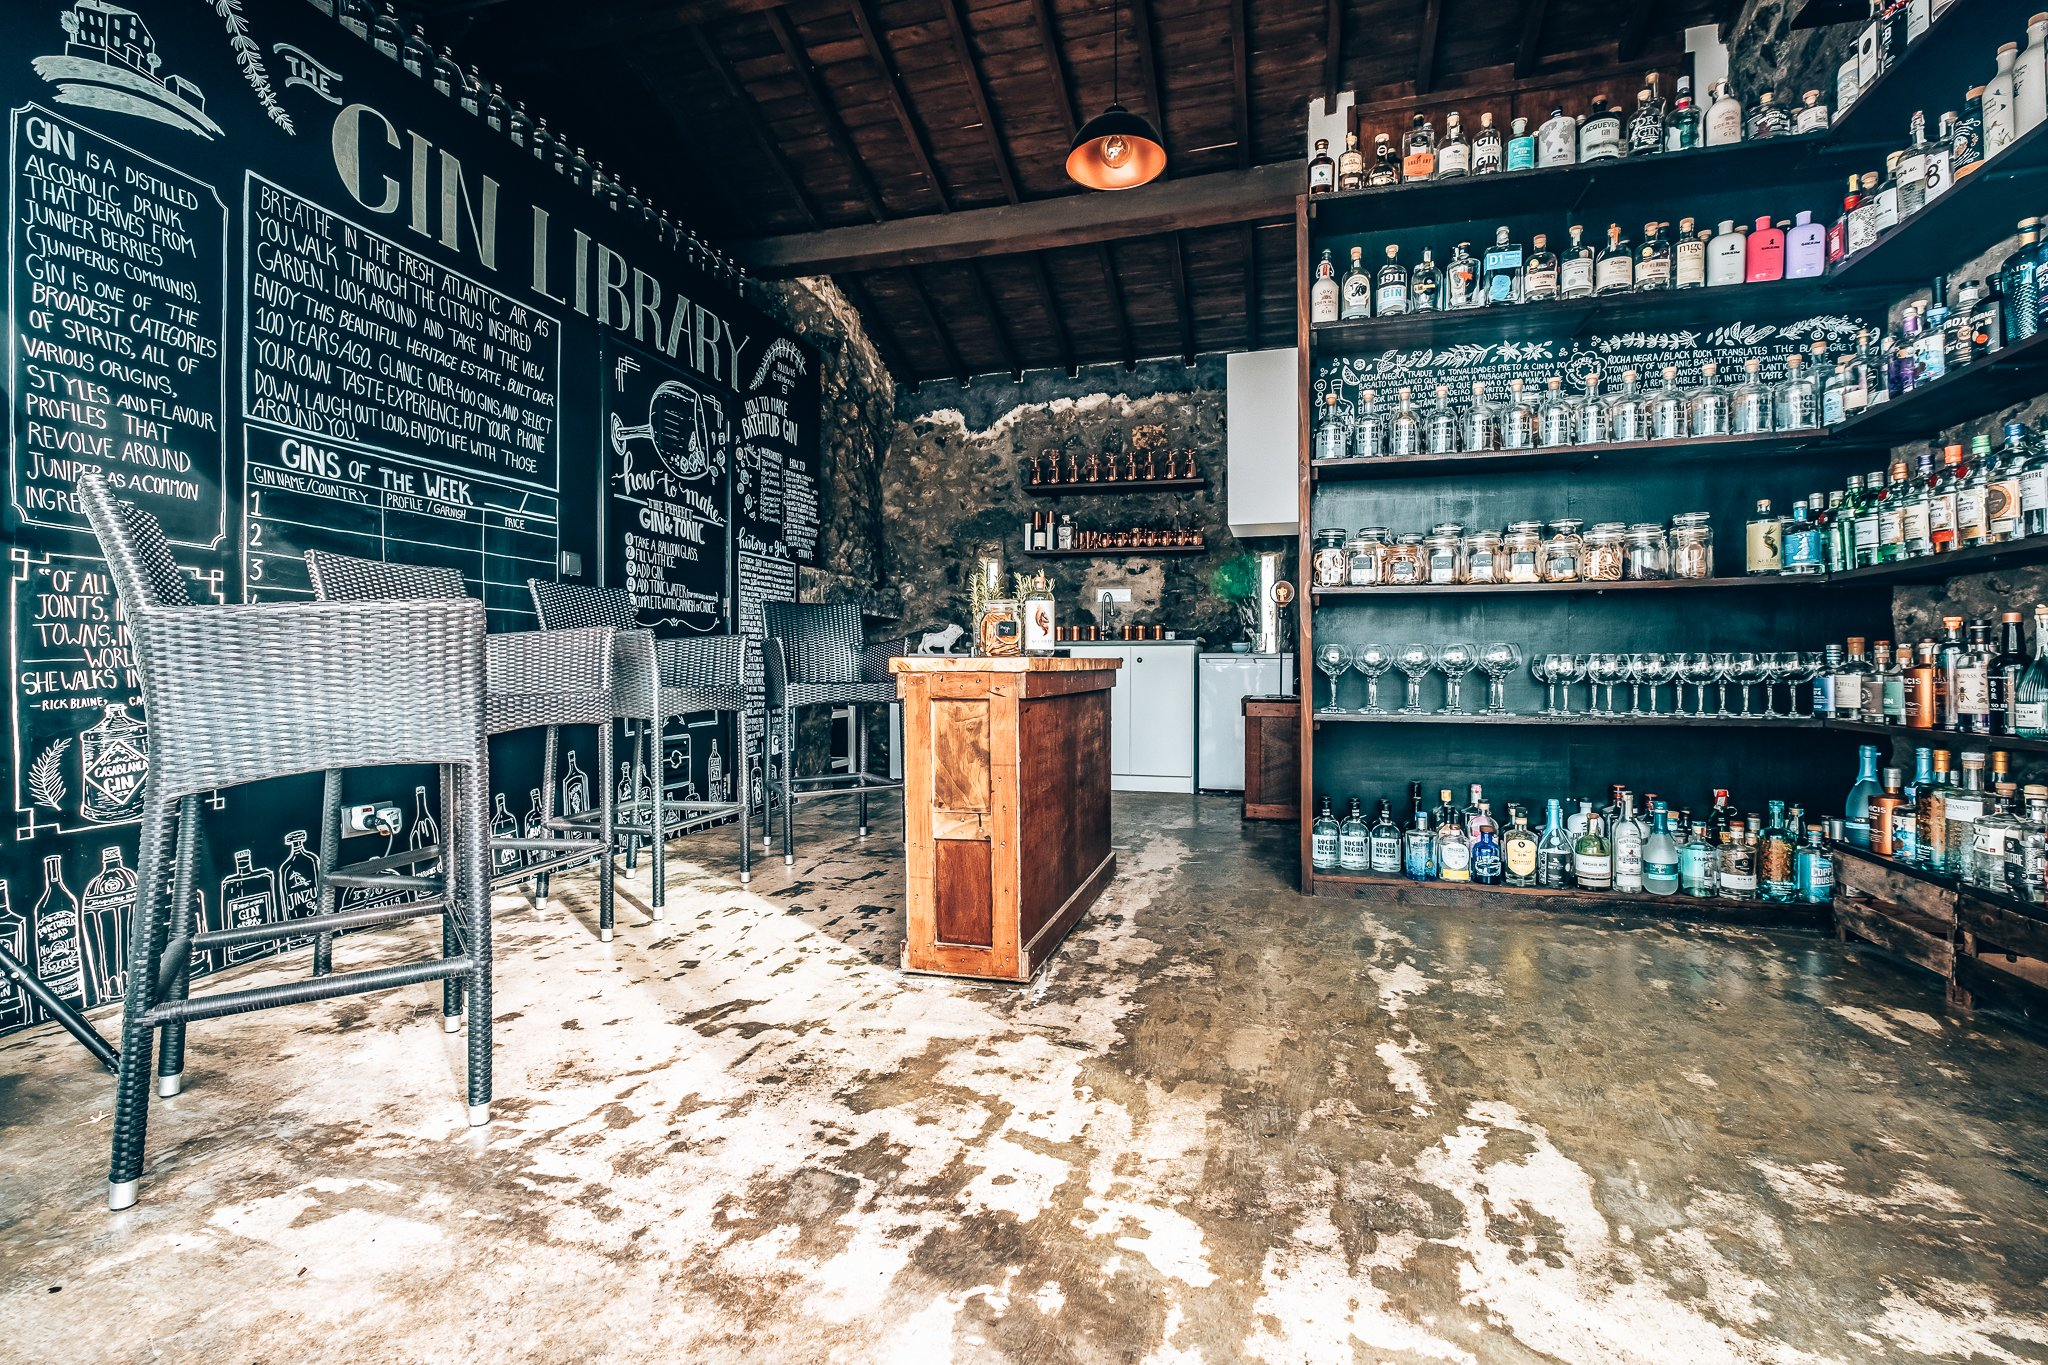 Prive gincollectie Solar Branco Eco Estate, Azoren, Alles over gin.